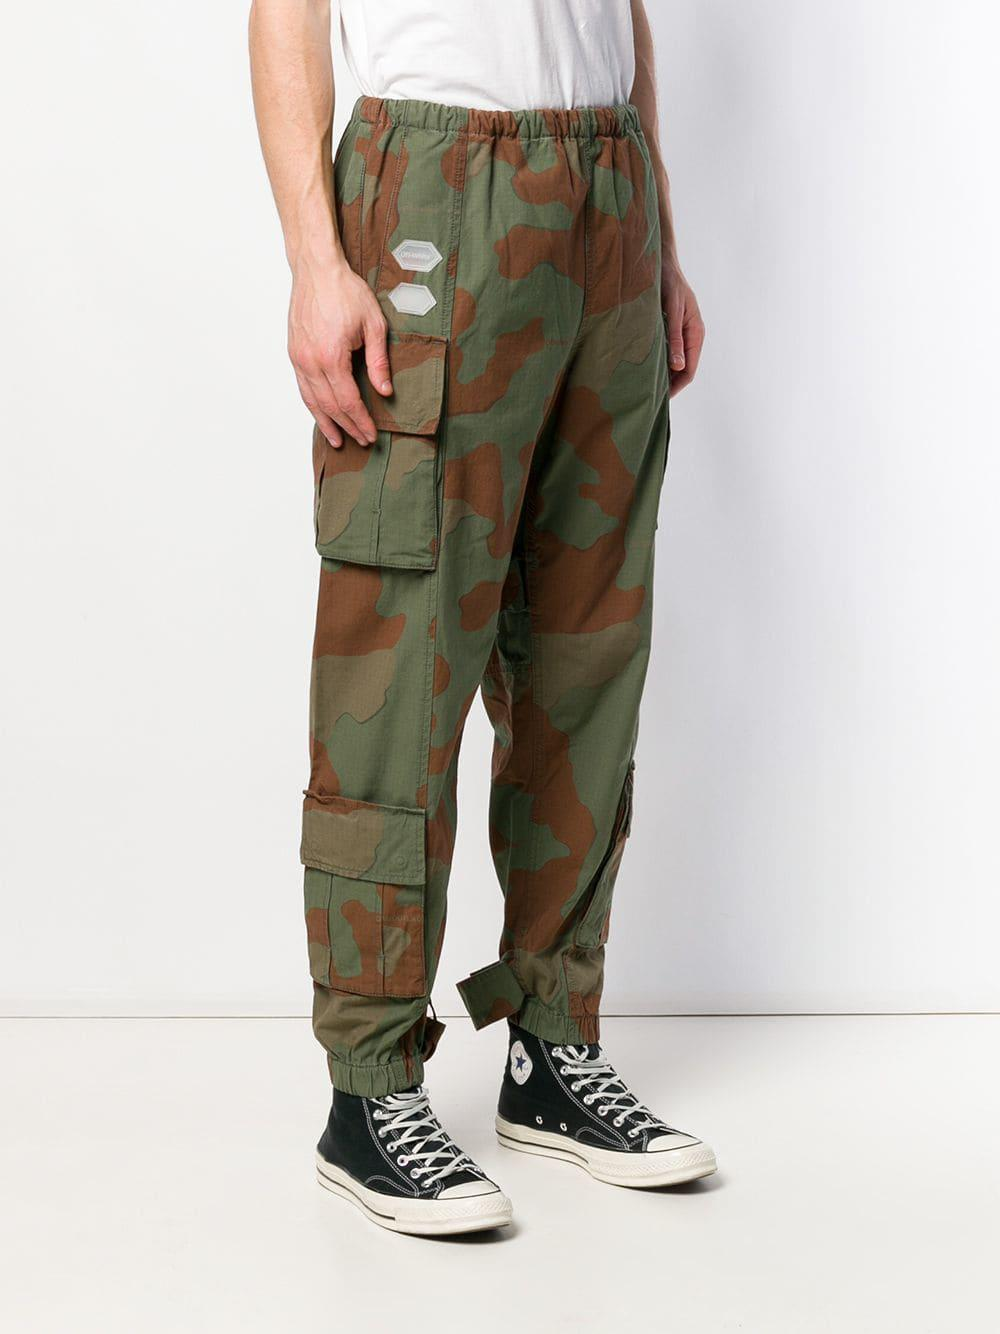 Pantalones Tipo Cargo Militares Off White C O Virgil Abloh De Algodon De Color Verde Para Hombre Lyst